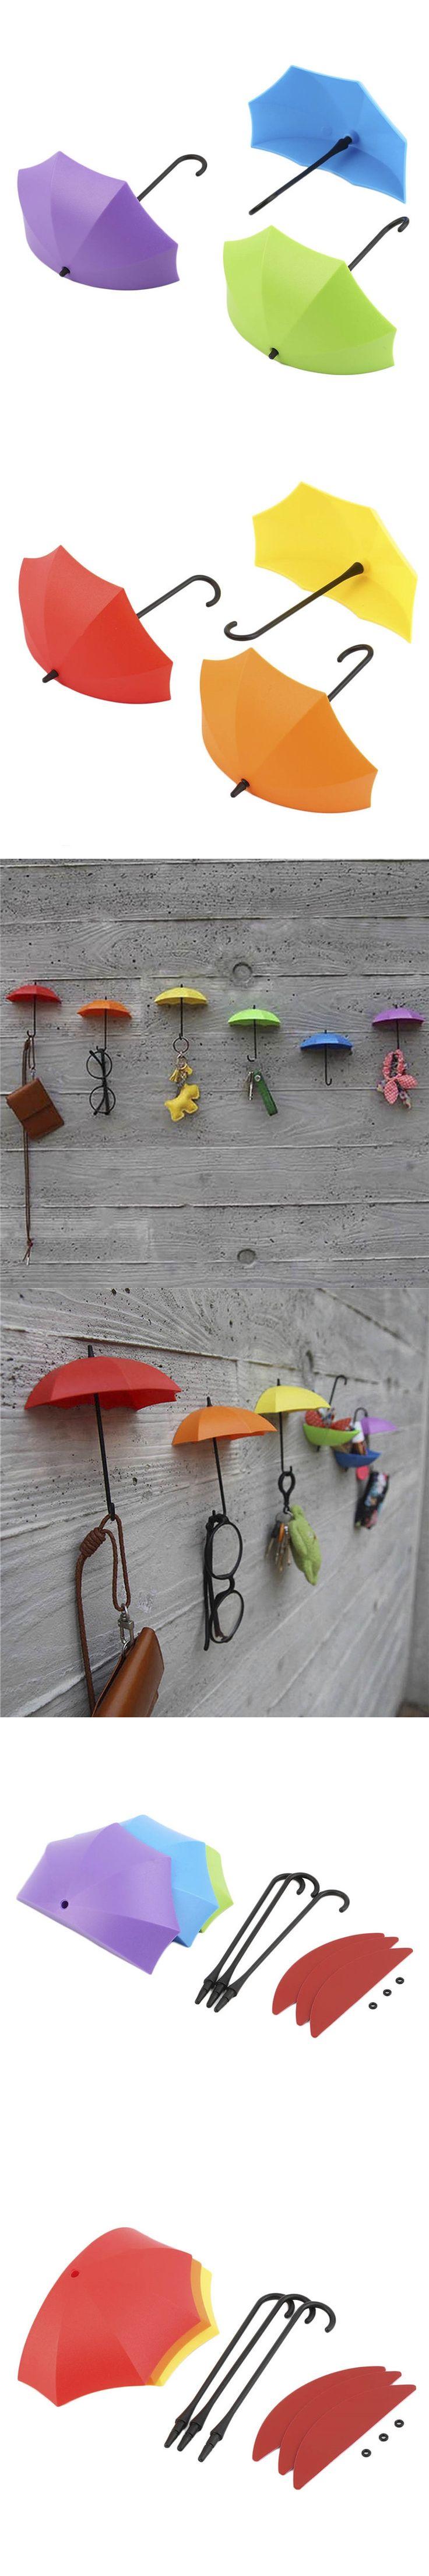 3pcs Pretty umbrella wall hooks Free nail glue wall mounted hooks Creative home decor Storage of small objects